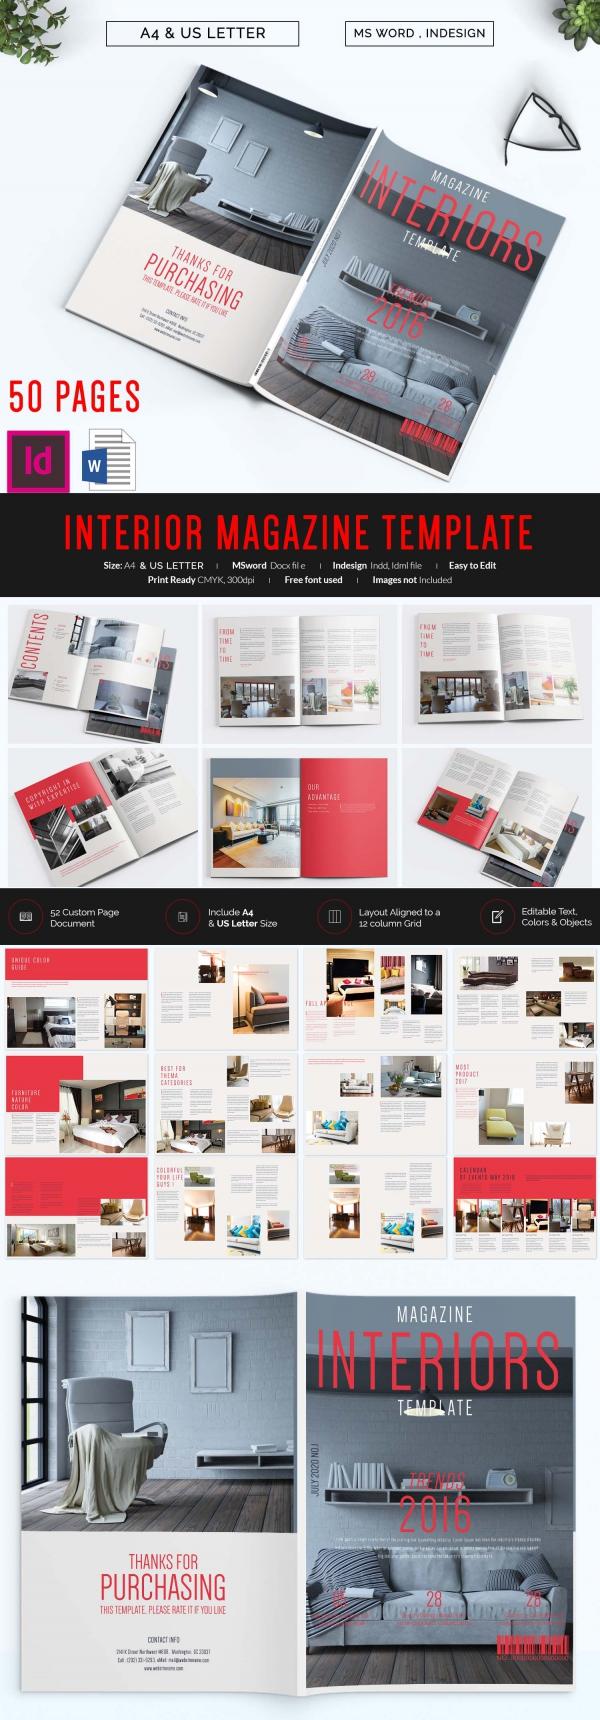 Brand New Interior Magazine